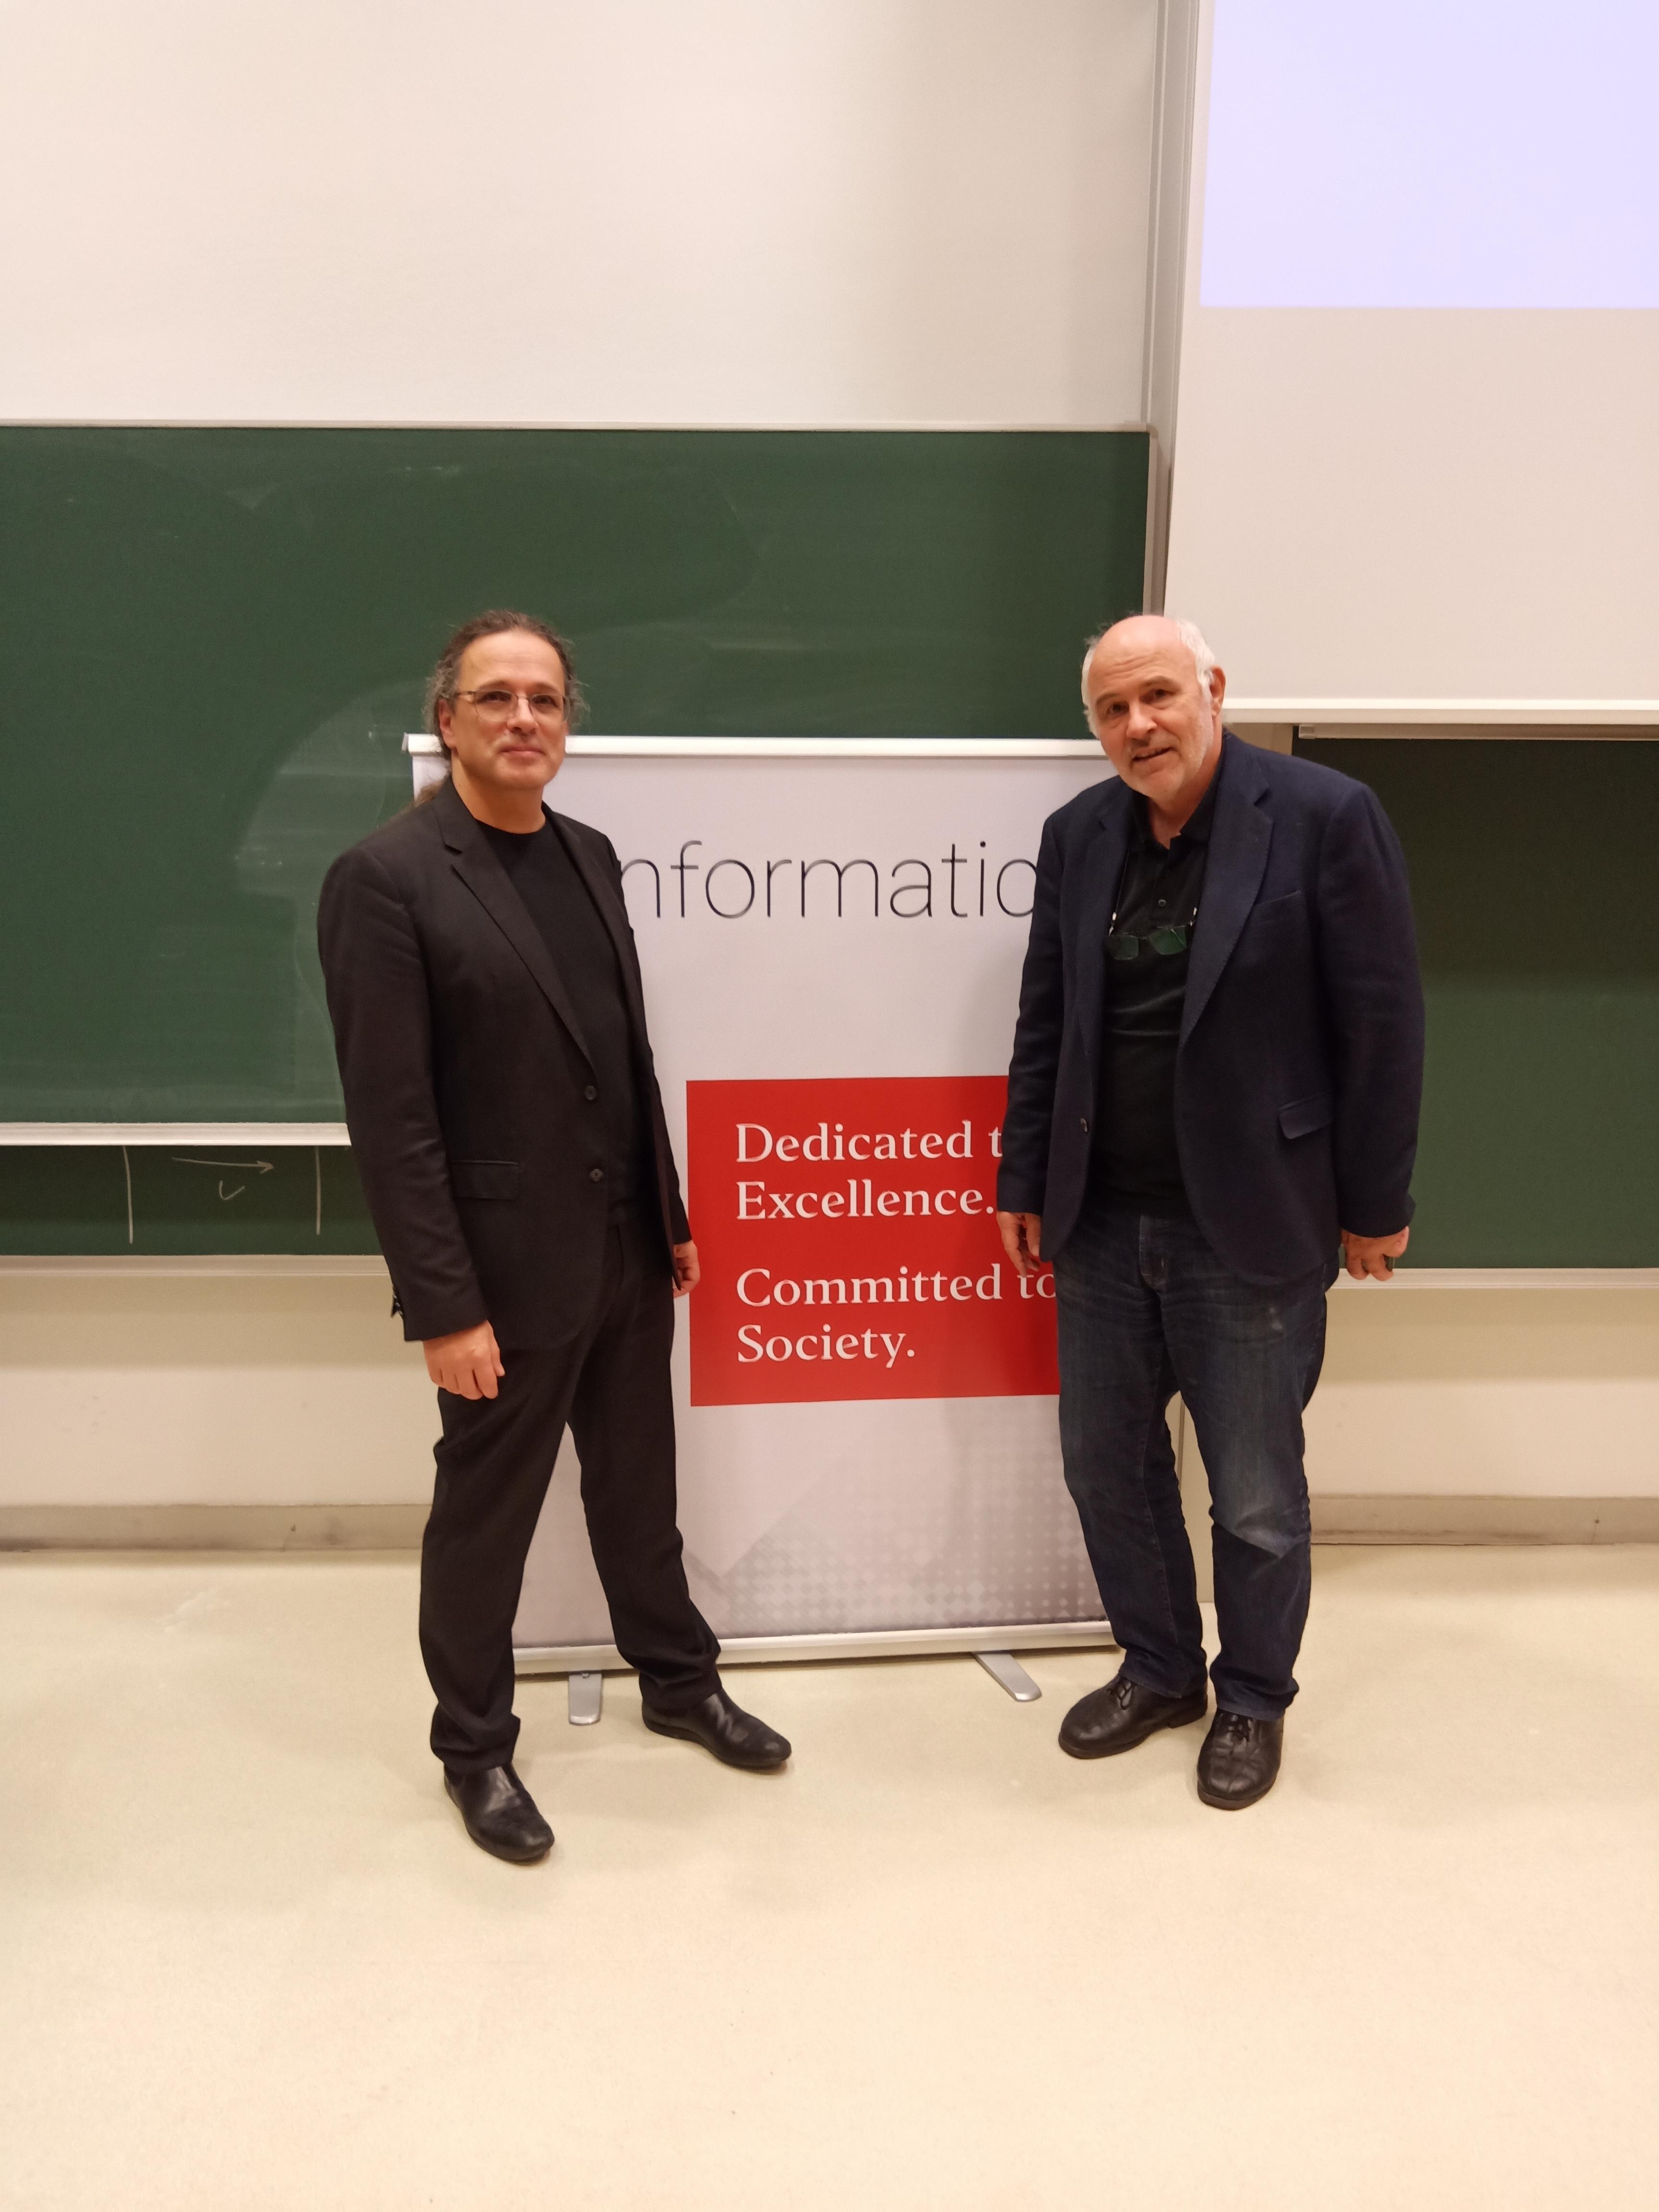 Gerfried Stocker and Prof. Werthner